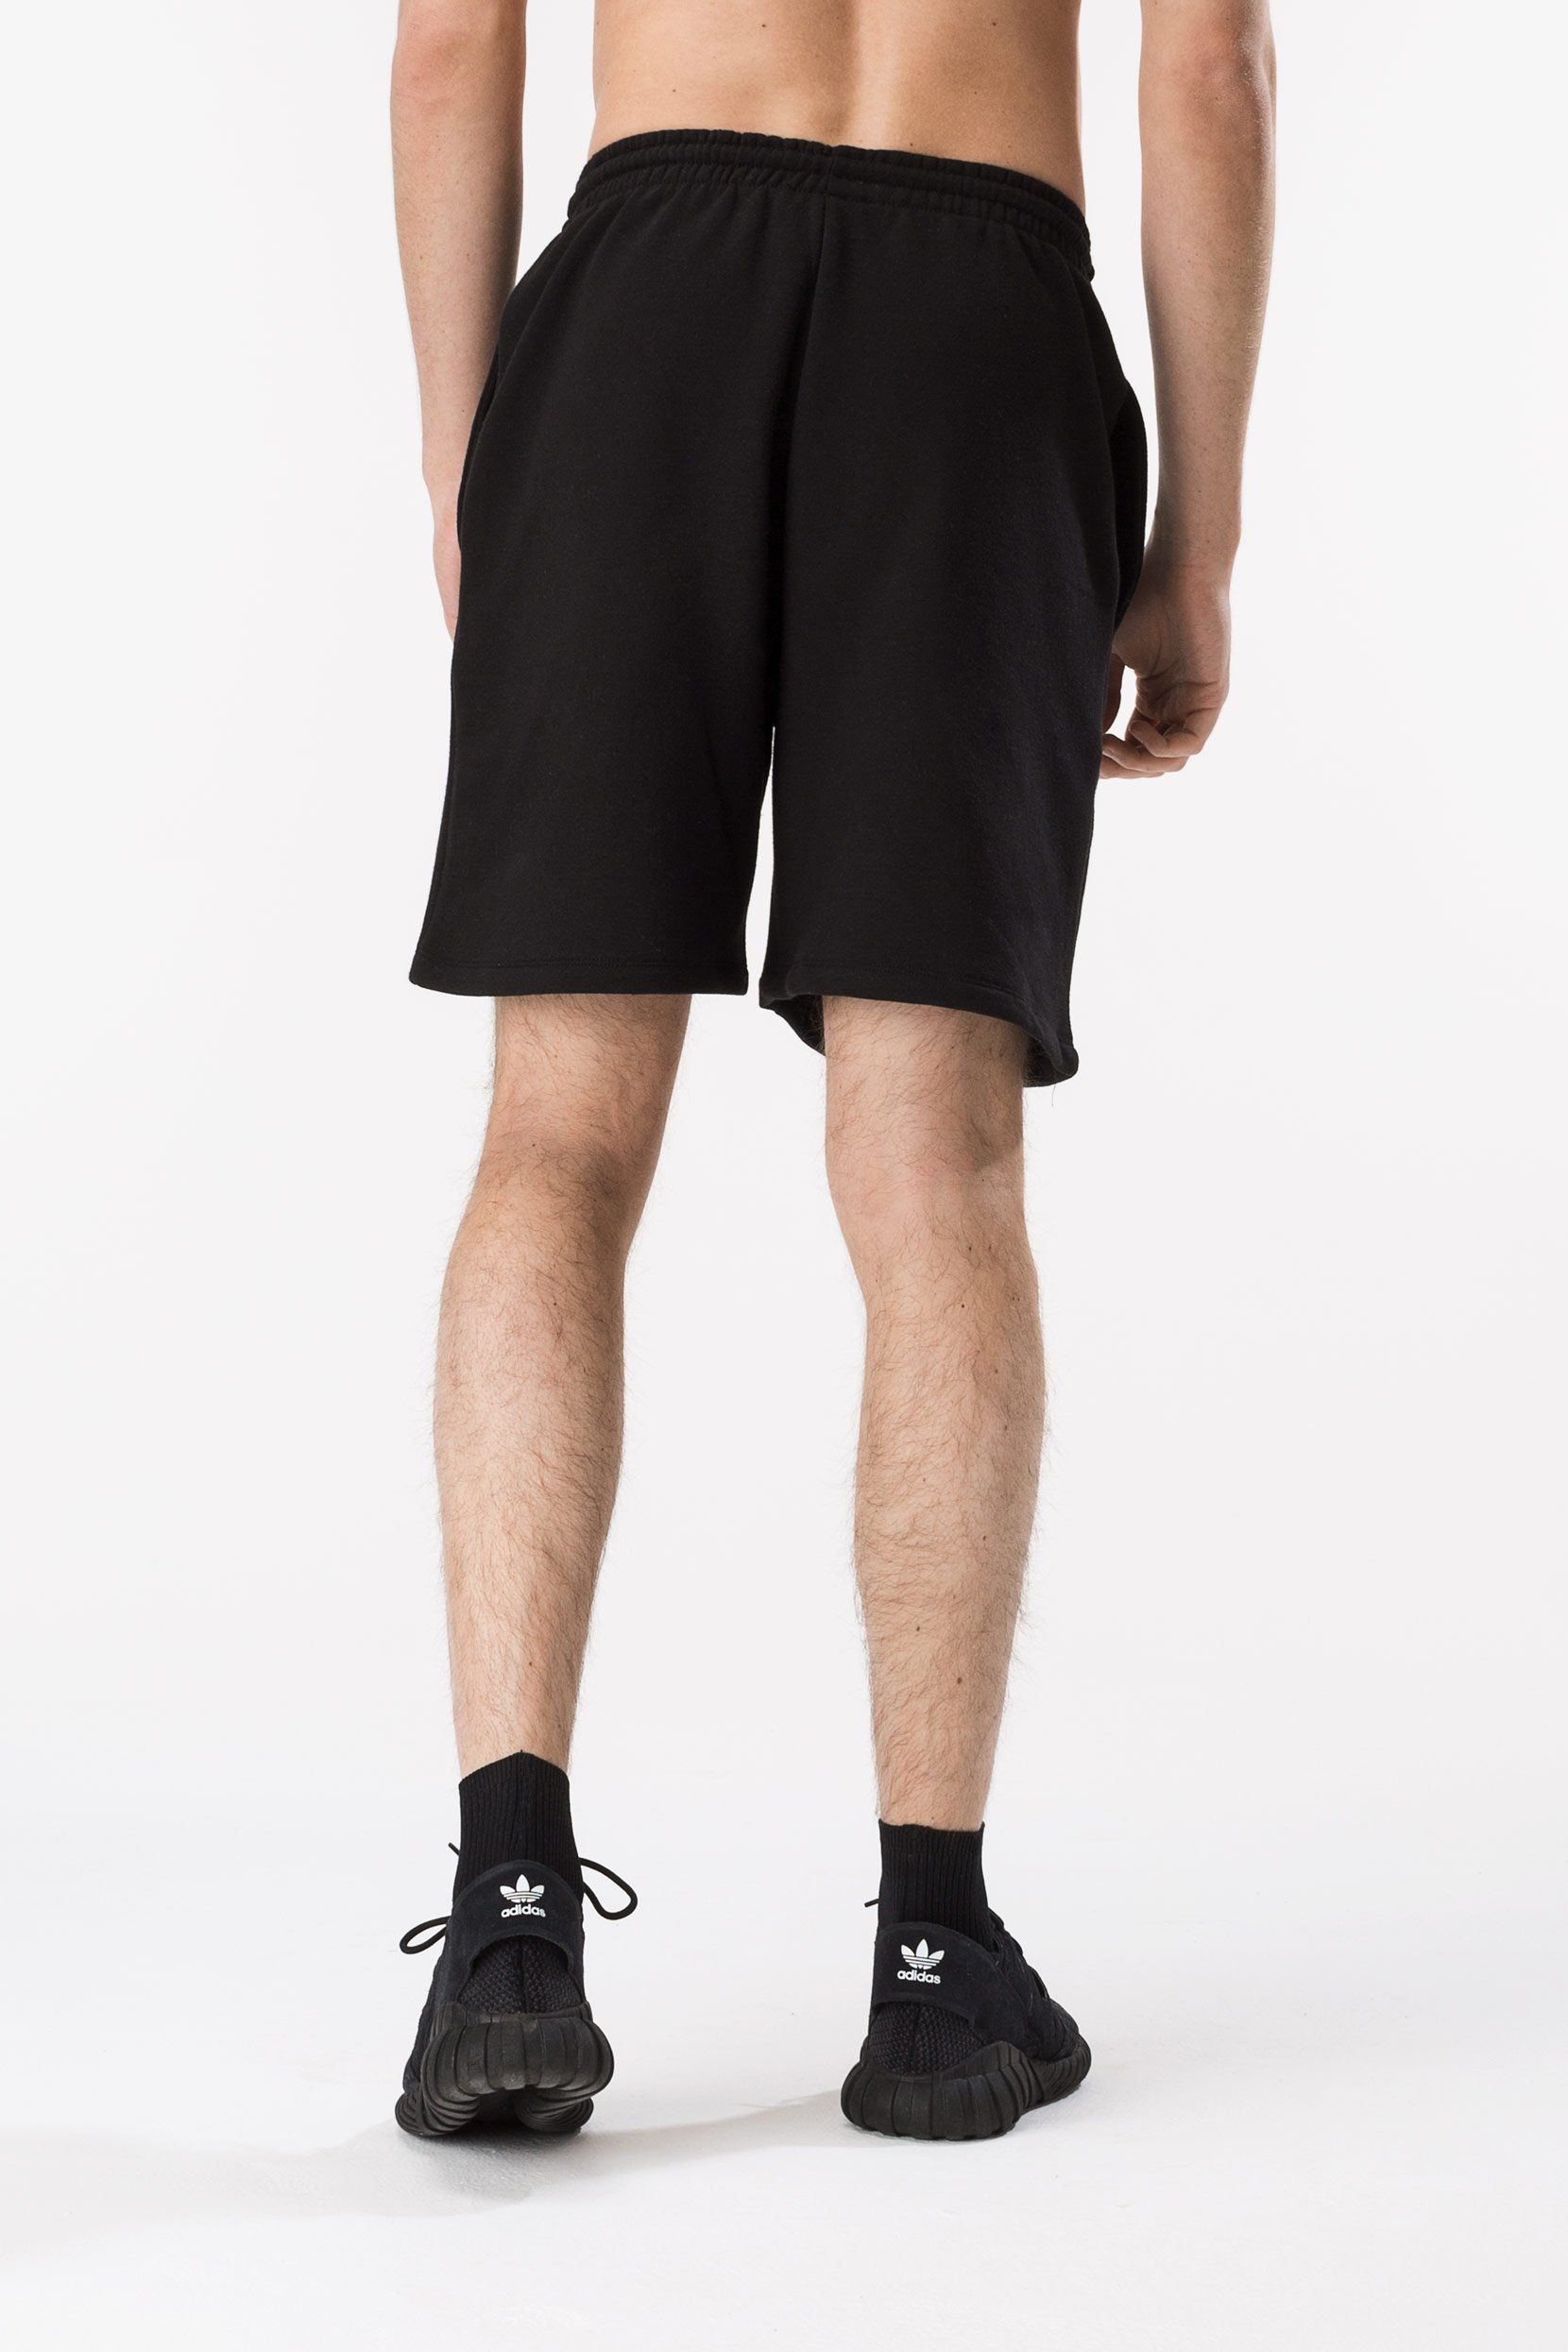 Hype Black Script Mens Shorts